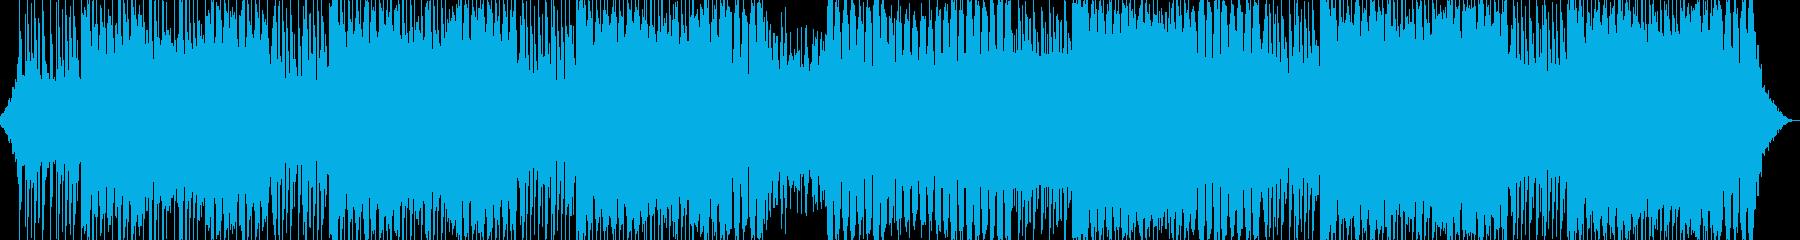 Advertisment Musicの再生済みの波形